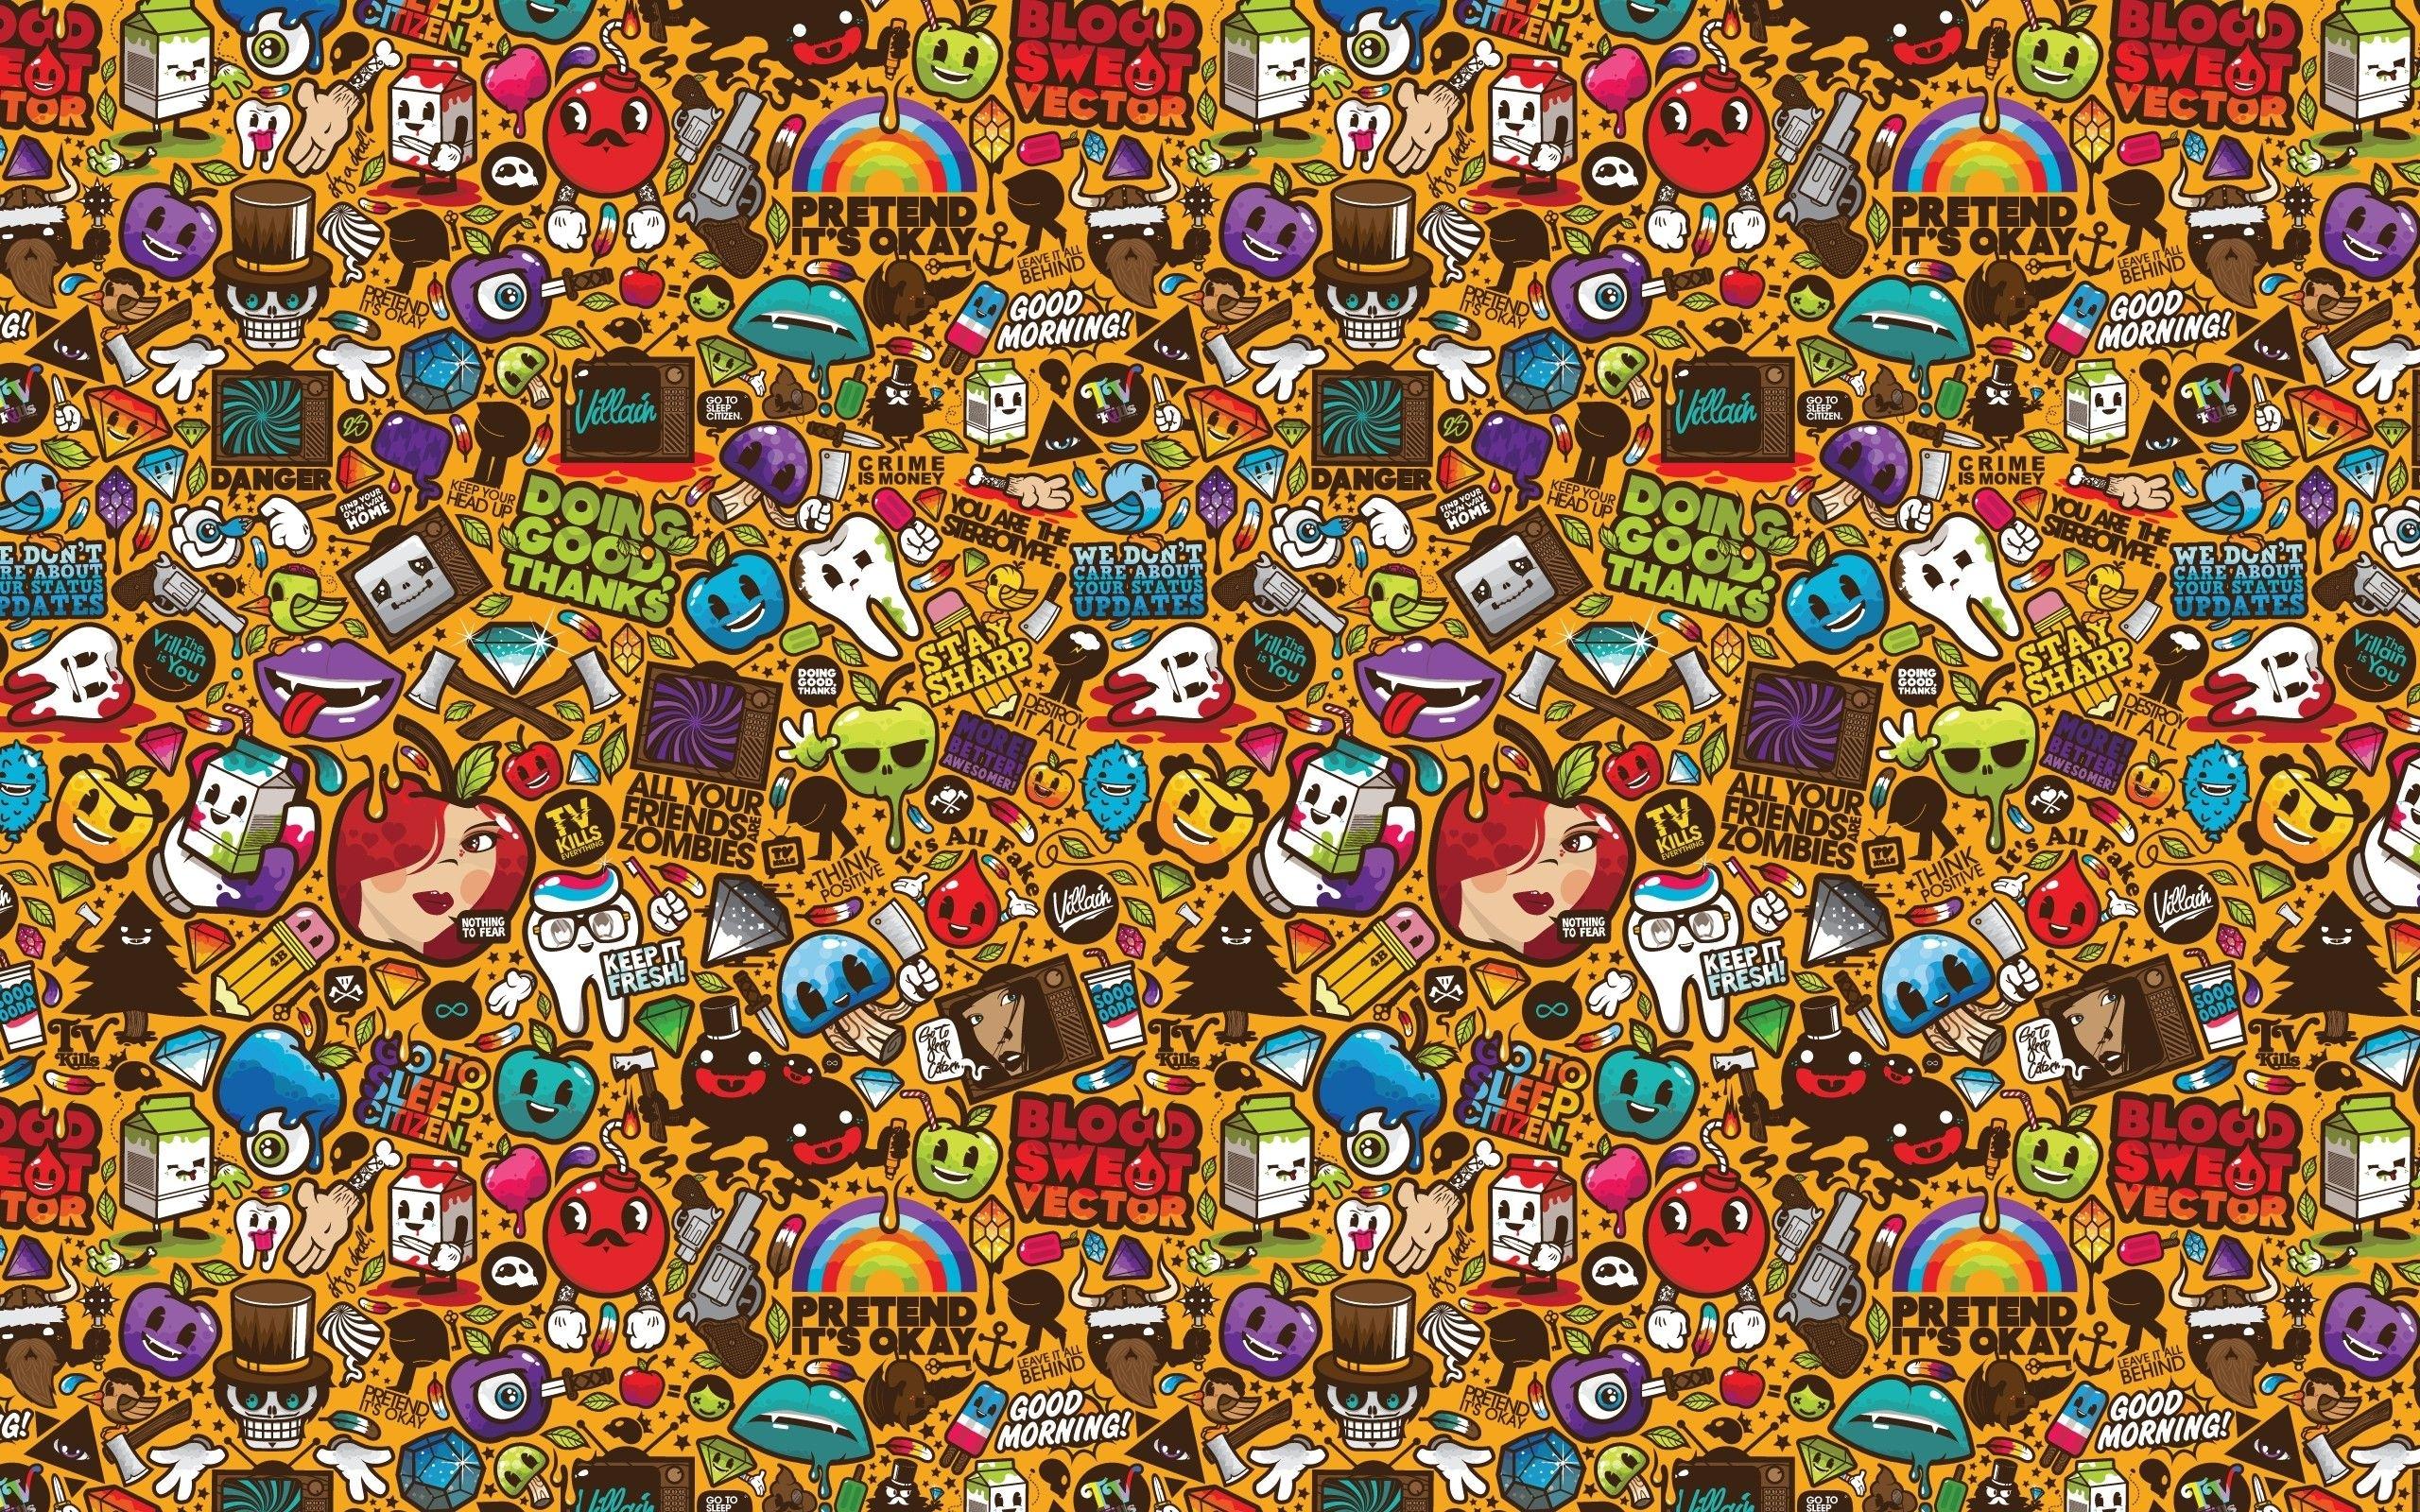 retro-pop-art-jthree-concepts-jared-nickerson-hd-wallpapers